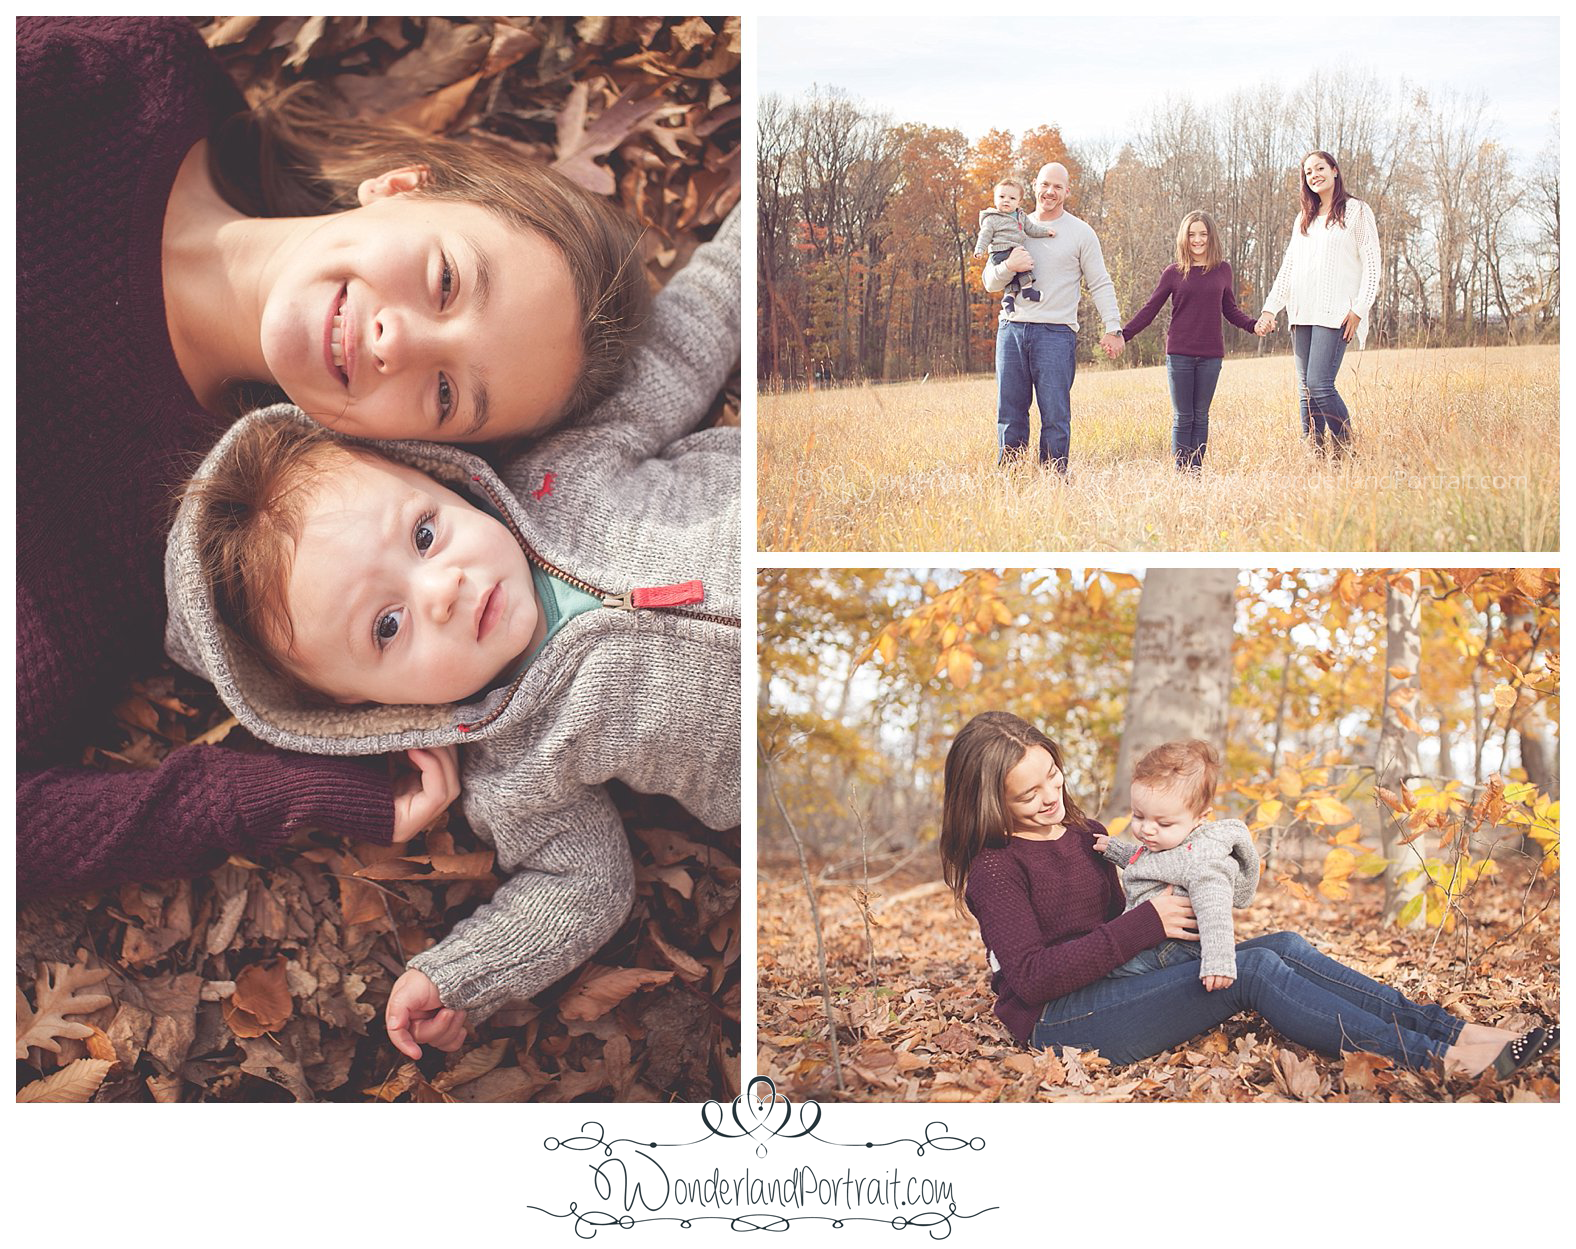 Bucks County PA Family Photographer- WonderlandPortrait.com